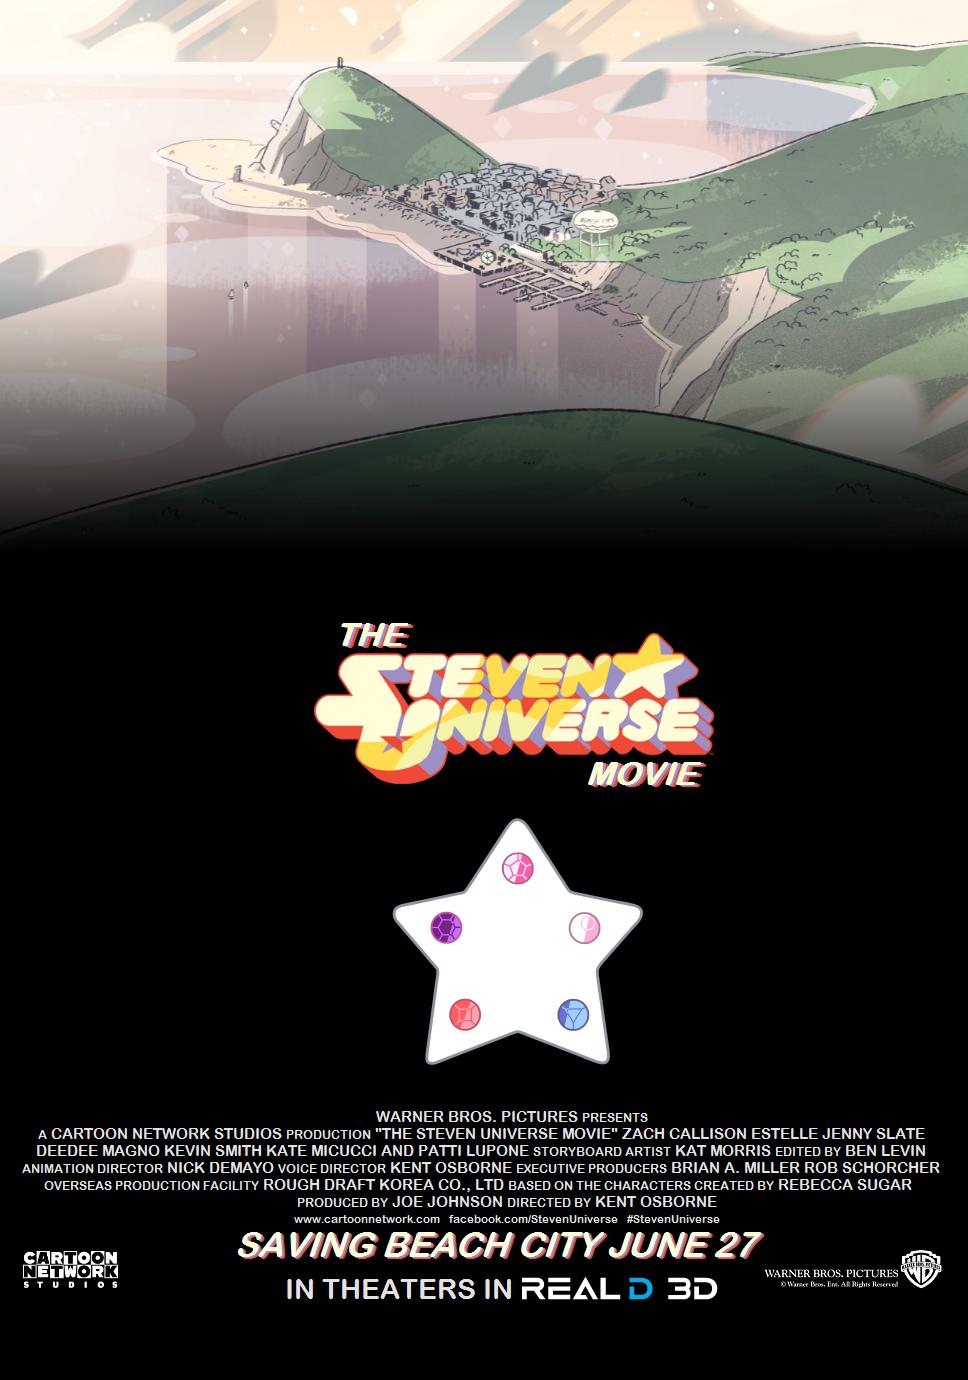 The Steven Universe Movie (SmashupMashups's Idea)   Idea